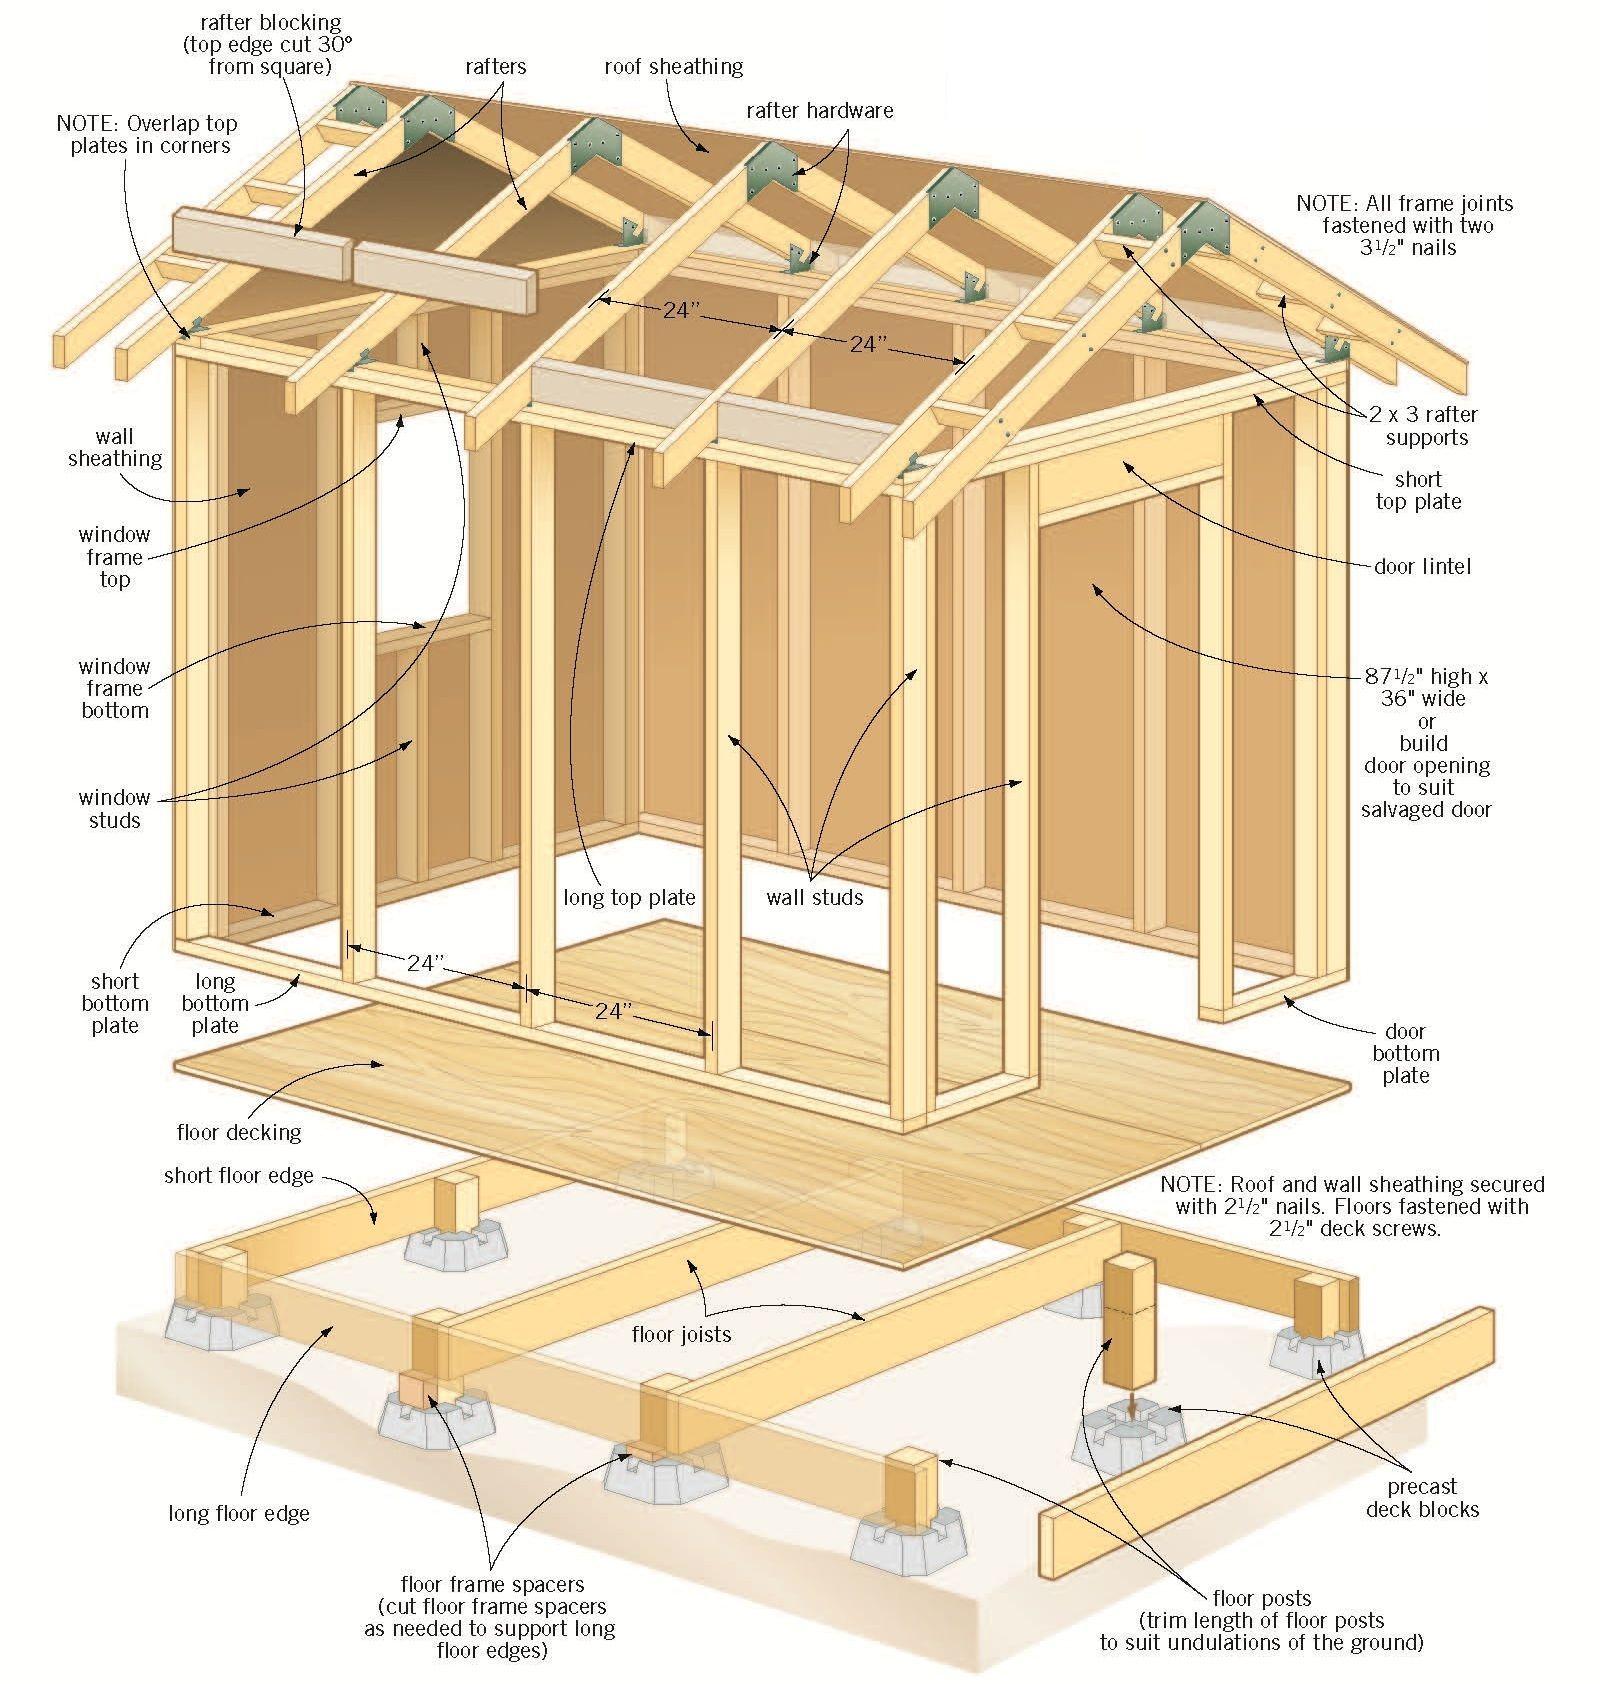 Shed Roof Porch Free Backyard Garden Storage Shed Plans Free Step By Step Shed Plans Diy Shed Plans Diy Storage Shed Plans Shed Blueprints